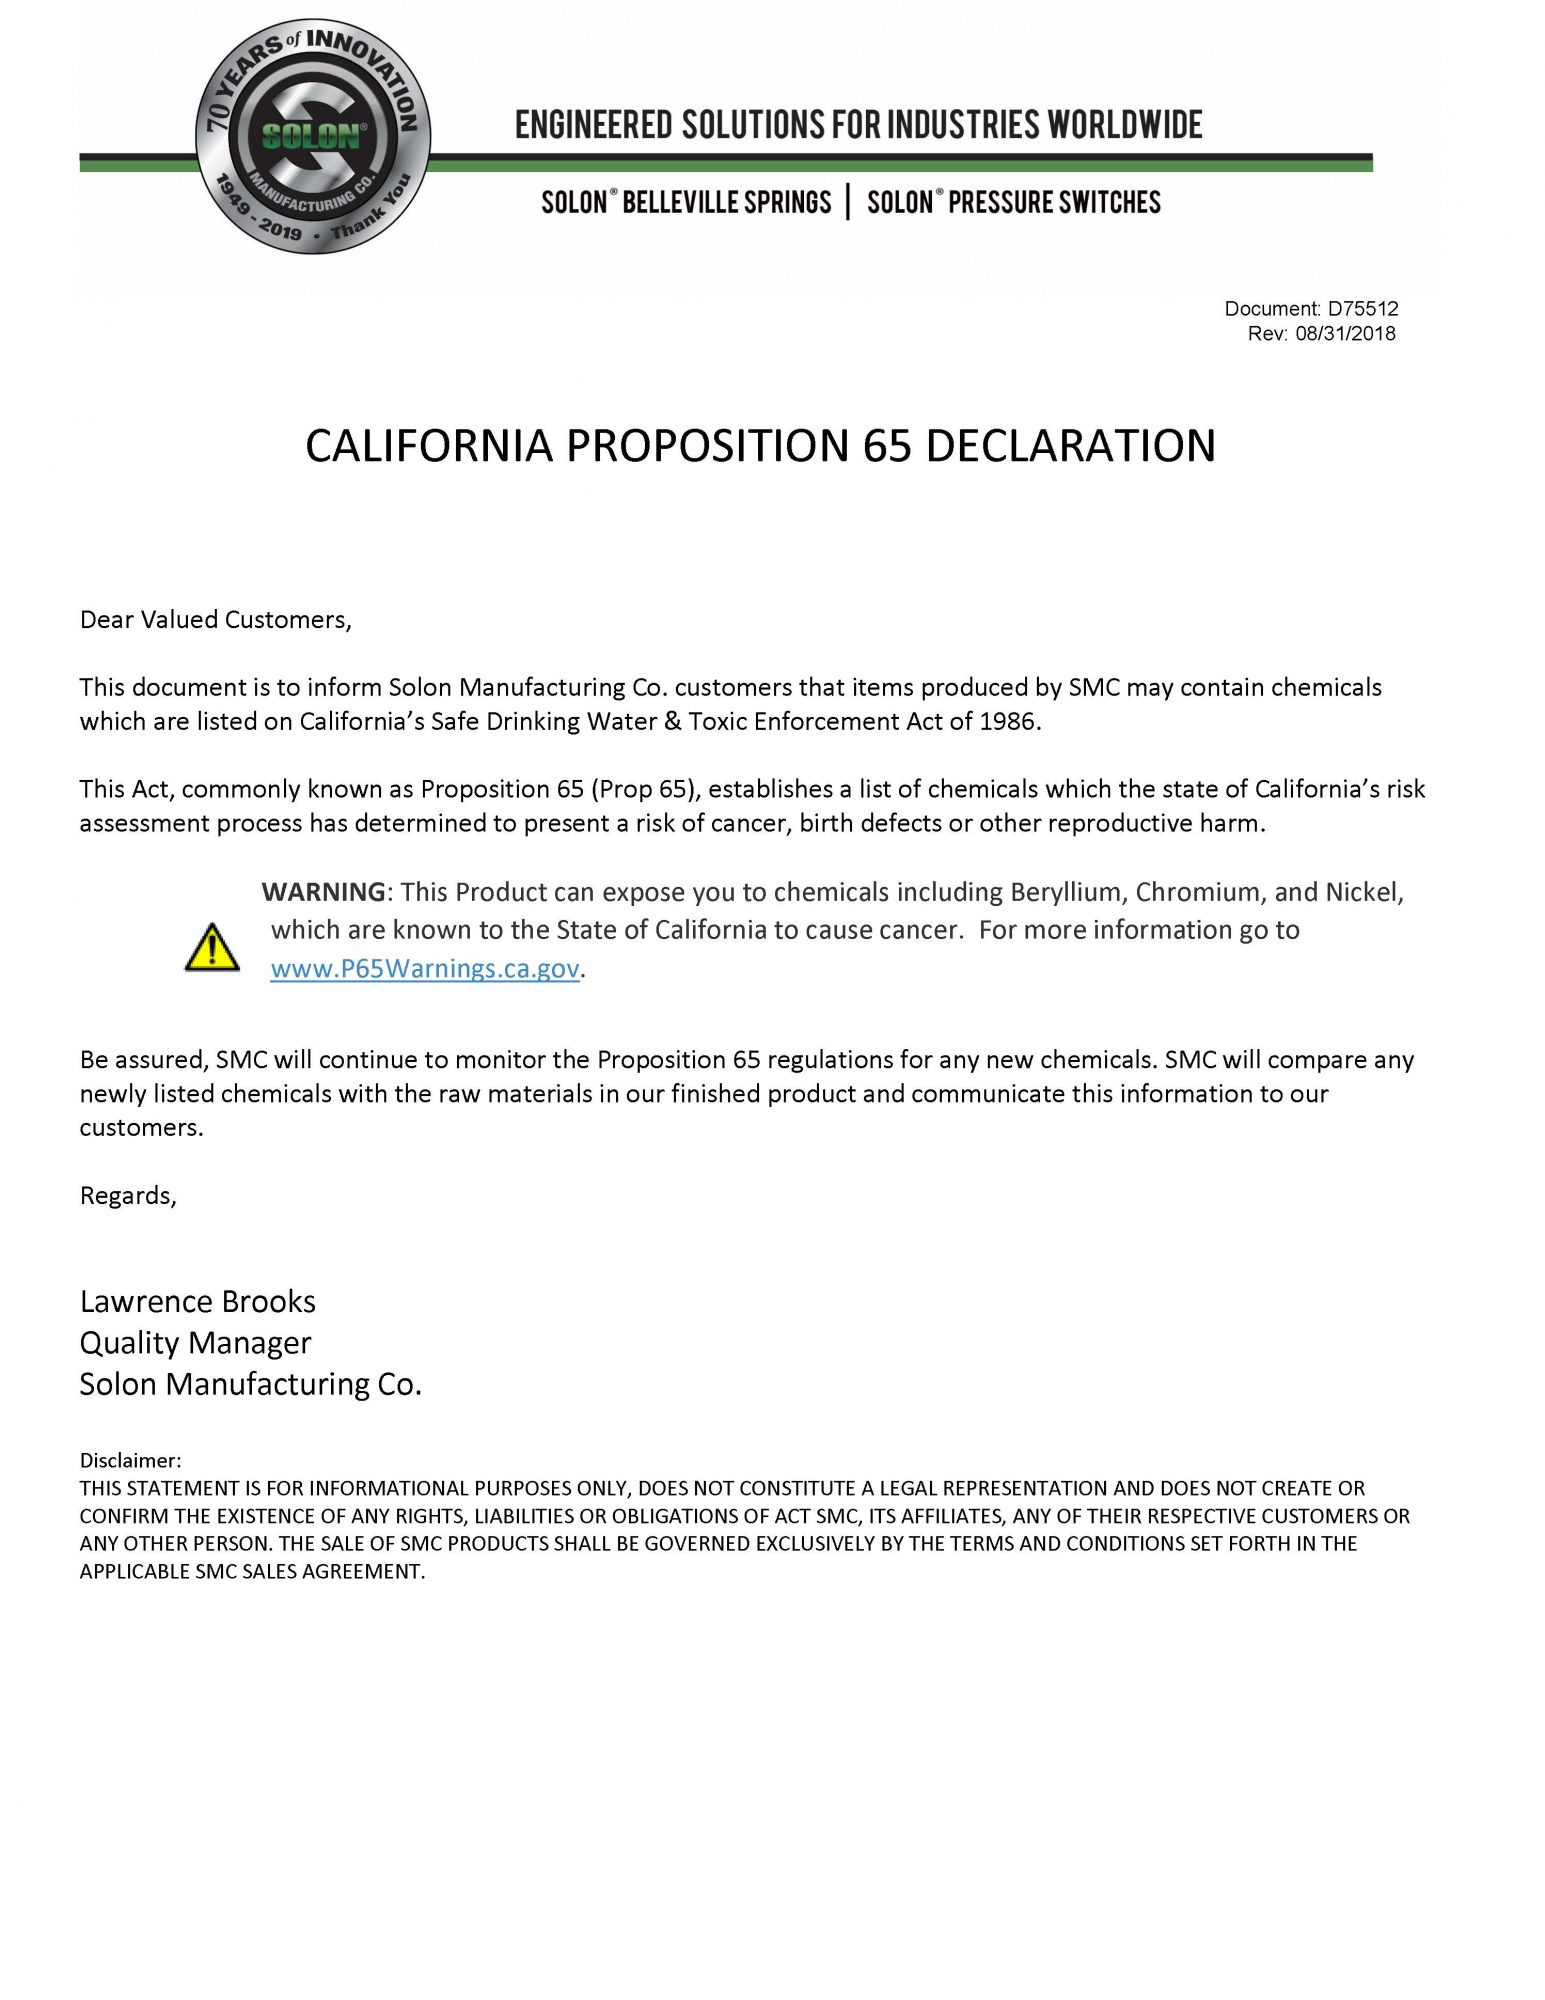 California Prop 65 Declaration